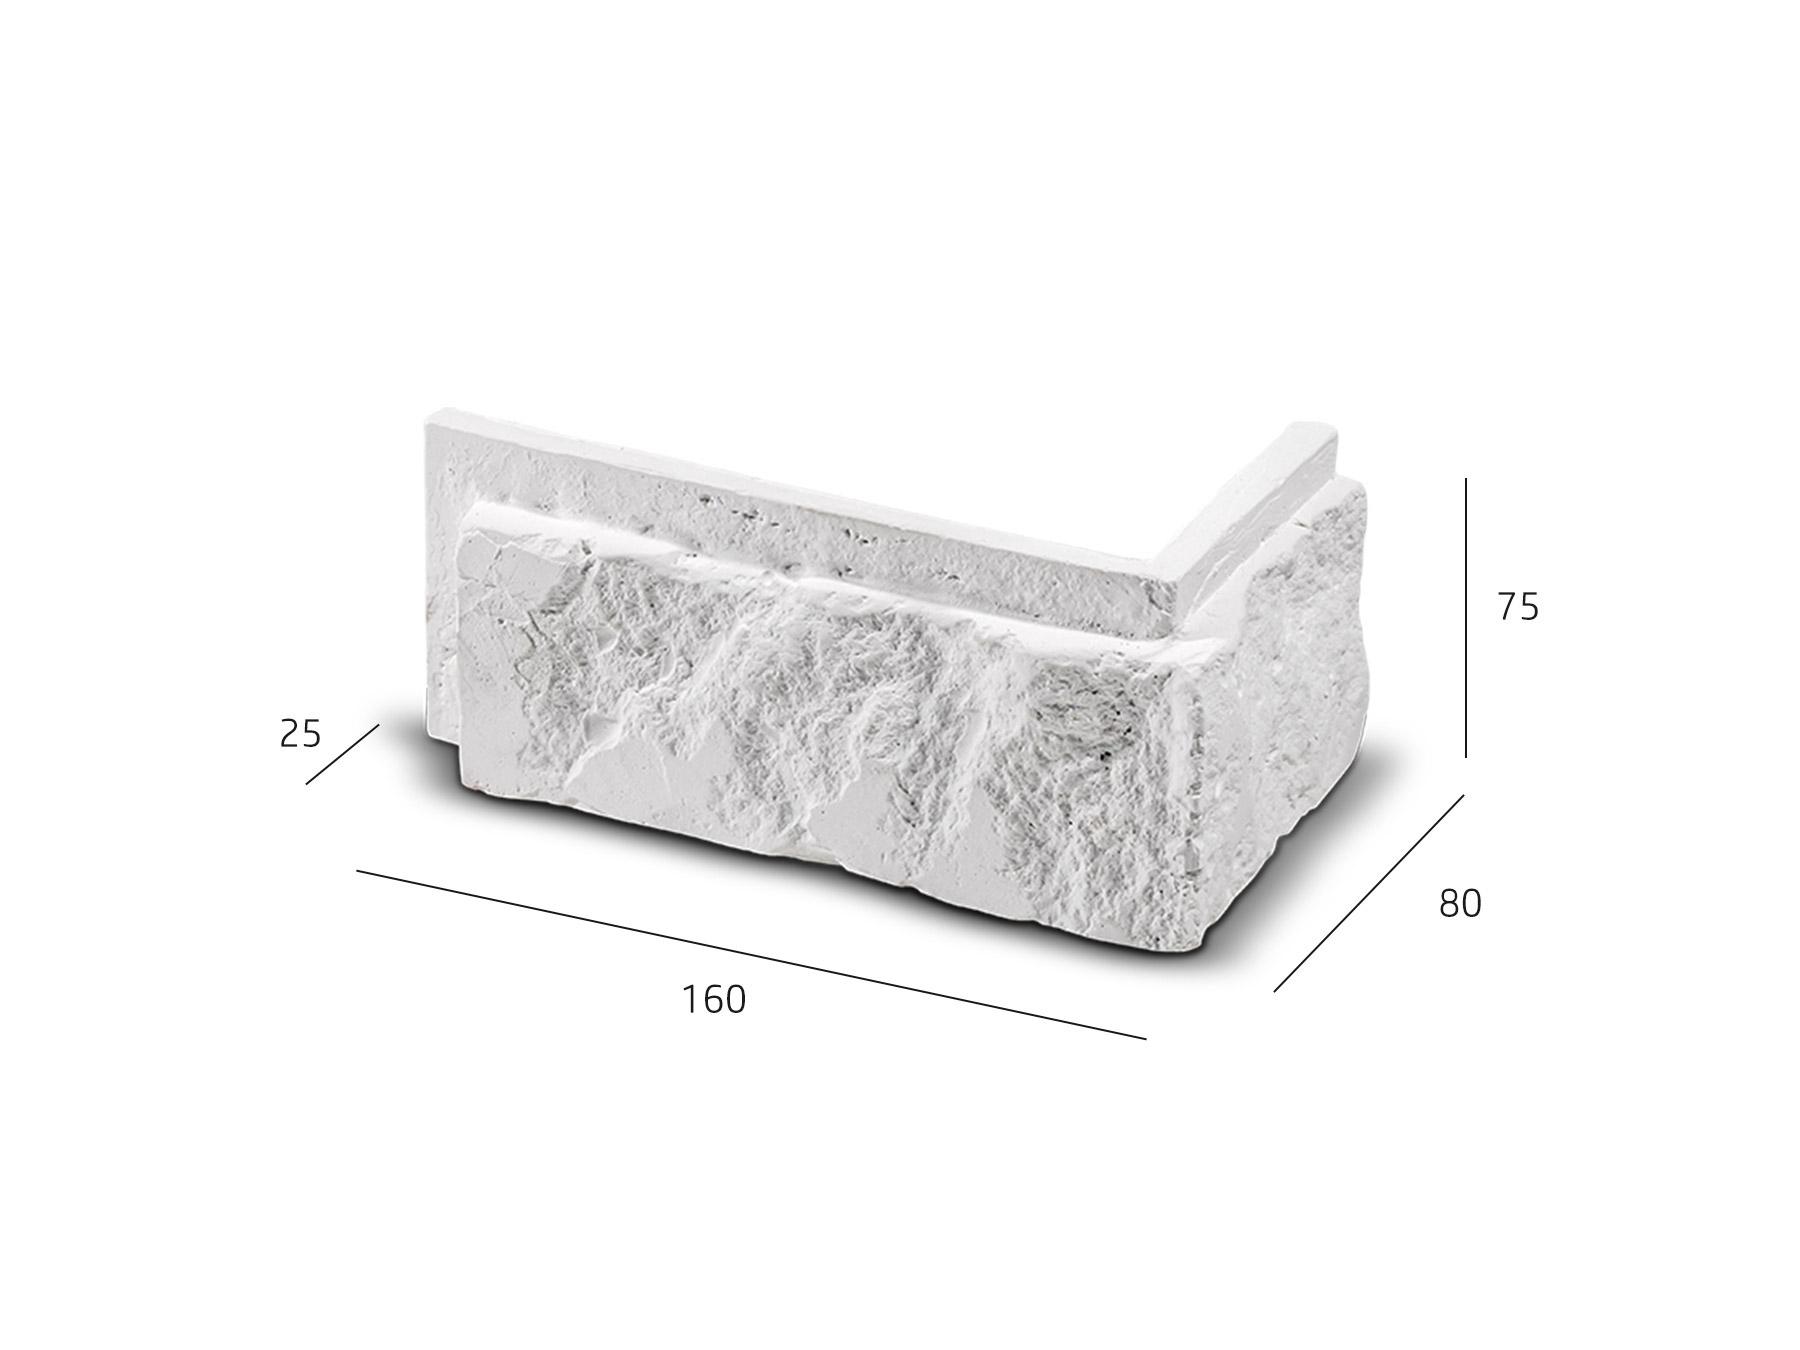 ROH Cihlový obklad se spárou BOTIN bílá 160x80x75x25 mm Sádra  balení 0,75bm